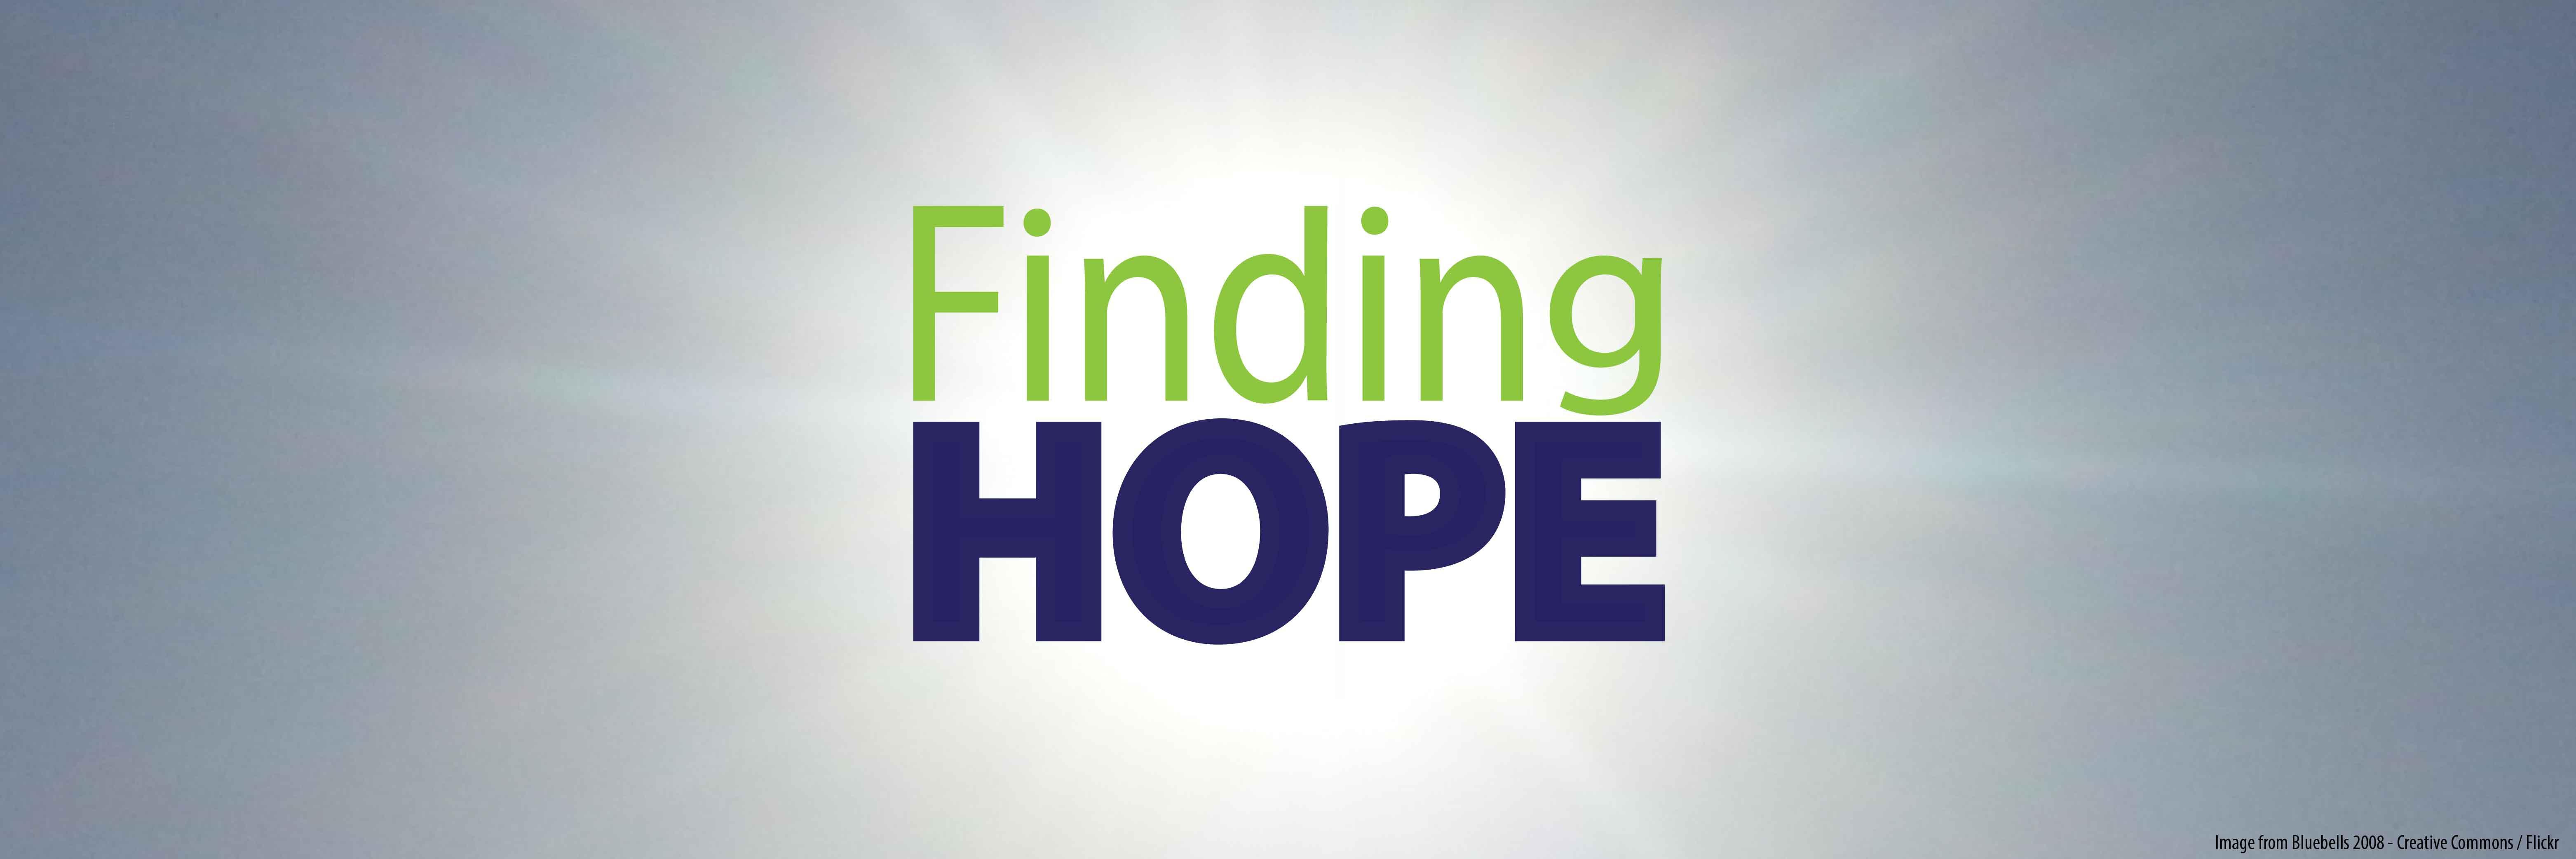 Finding Hope Twitter Header Image